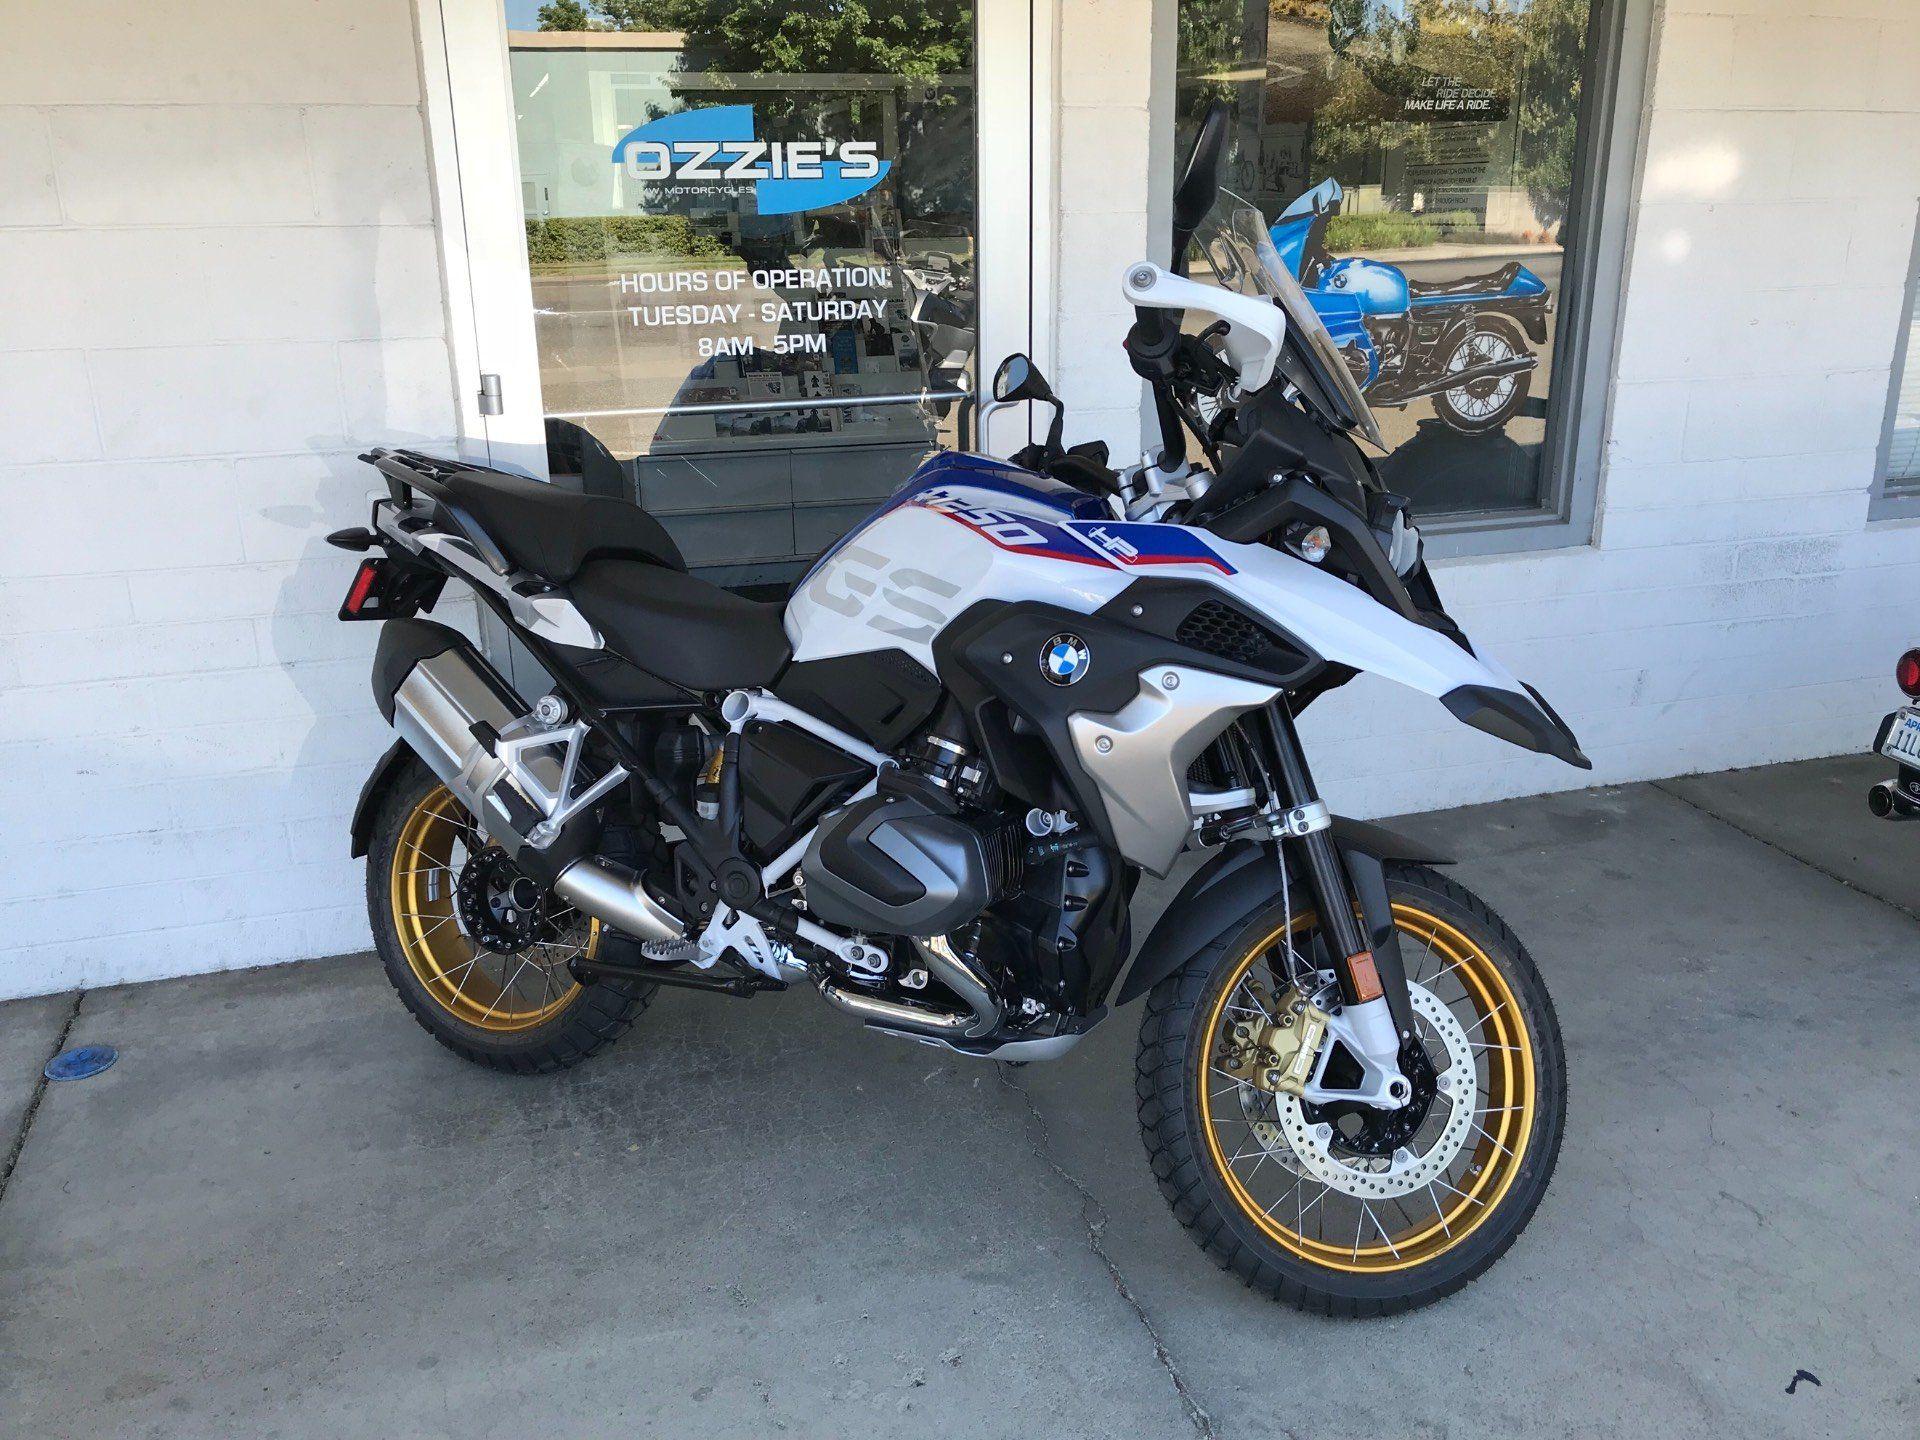 2019 Bmw R 1250 Gs In Chico California